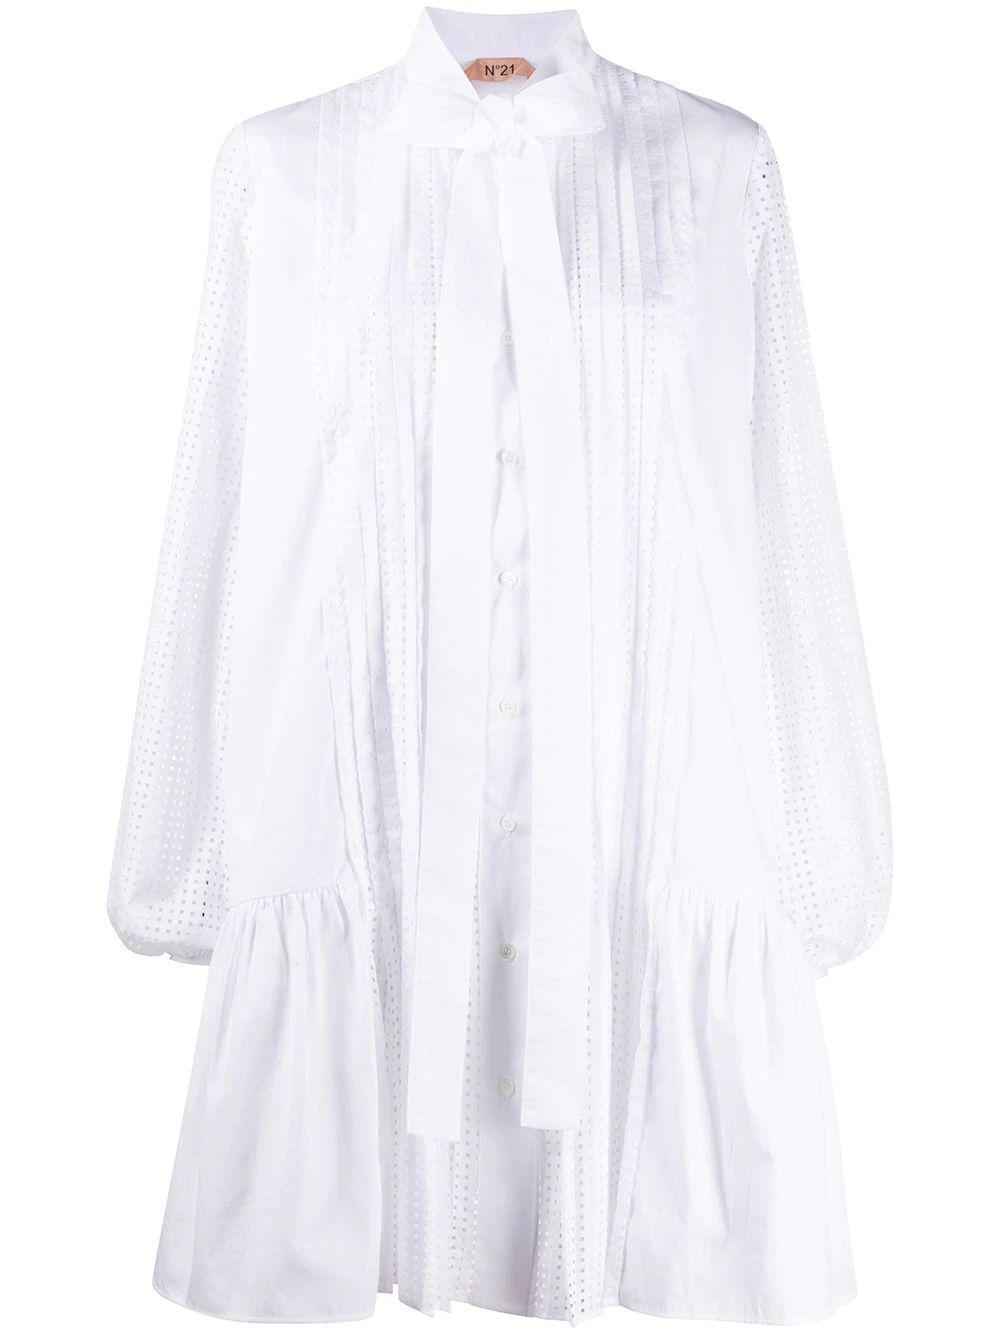 White Cotton Poplin Dress Item # H071-0605-1101